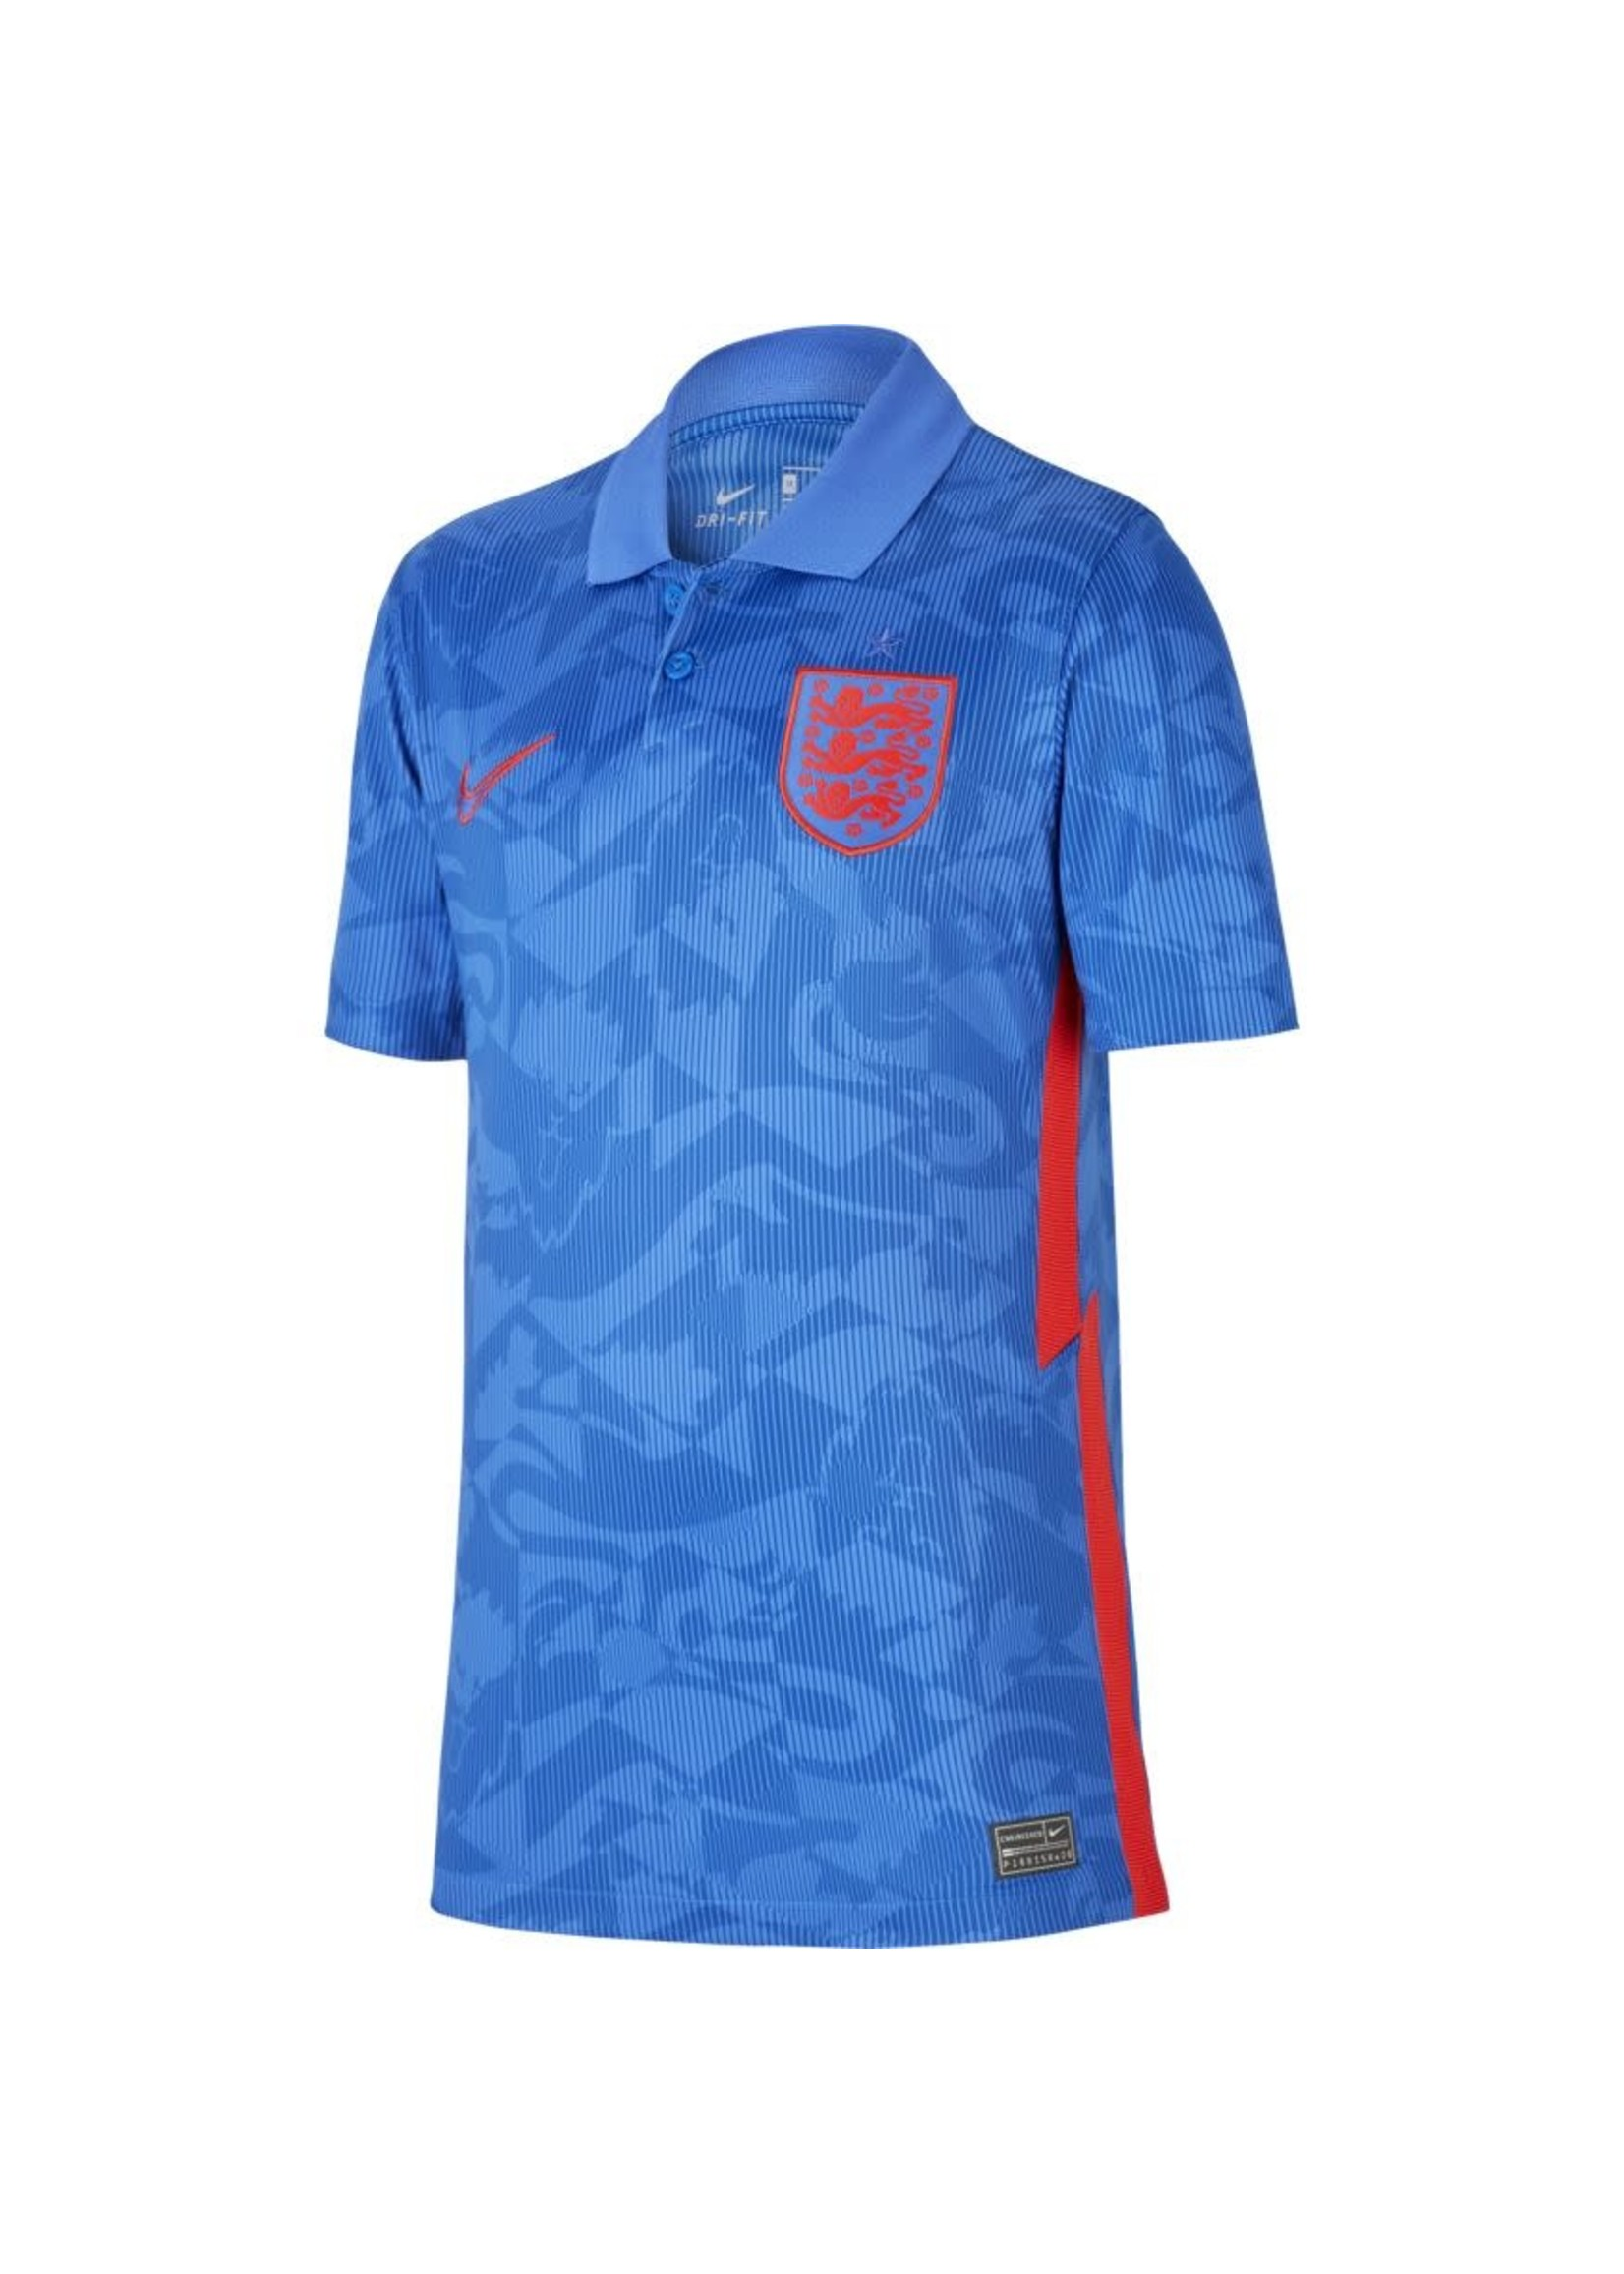 Nike England 20/21 Away Jersey Youth